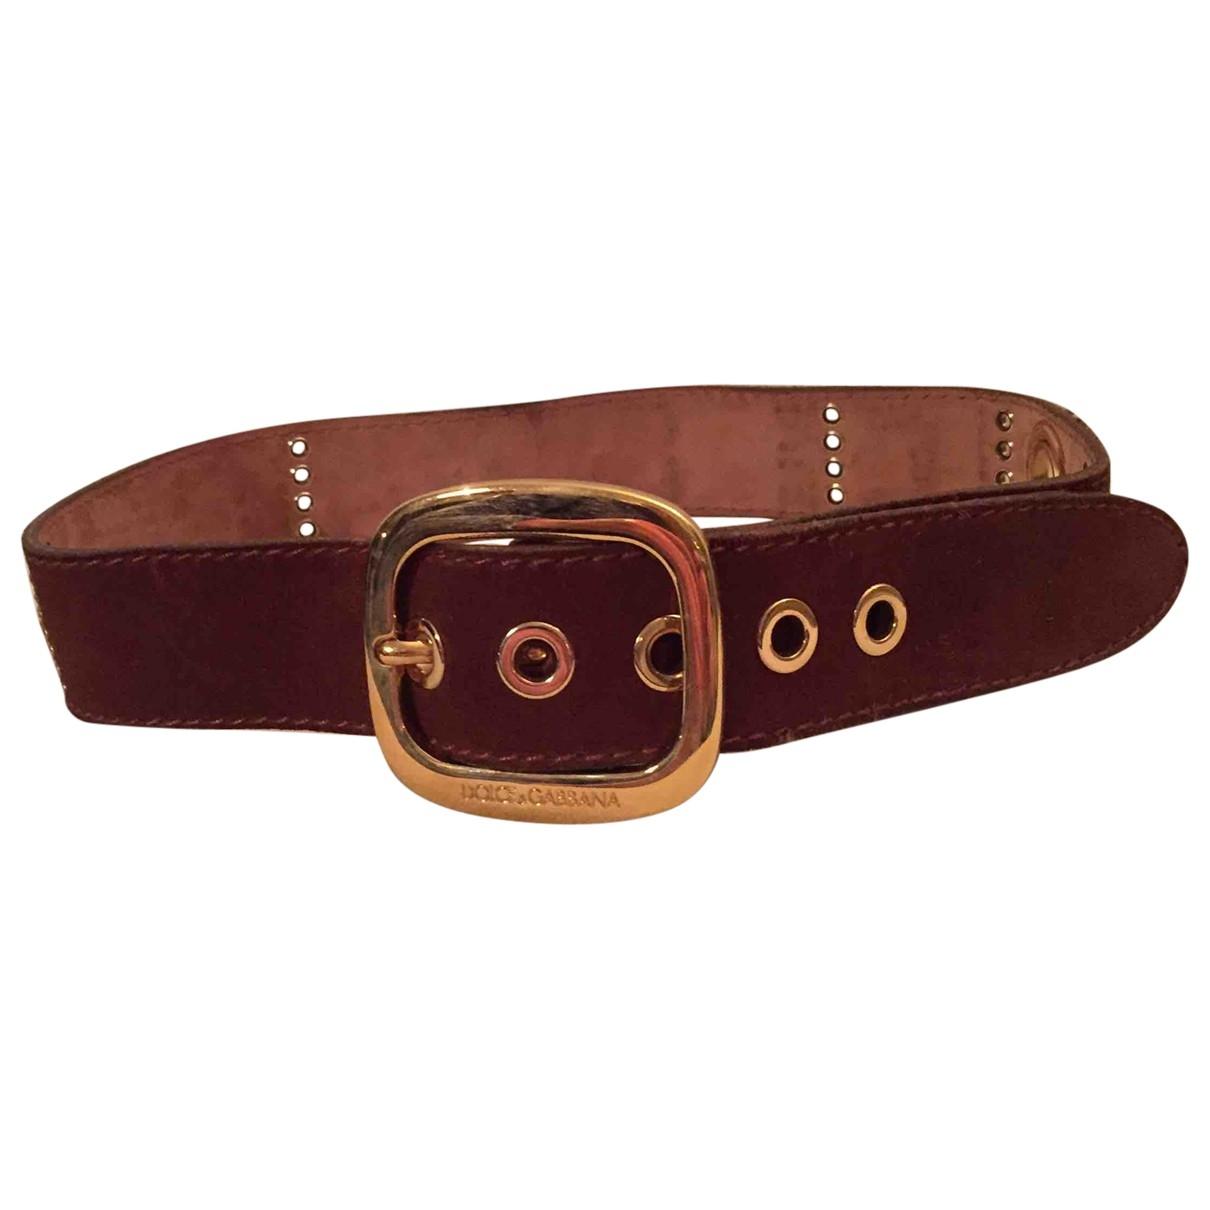 Dolce & Gabbana \N Brown Suede belt for Women M International